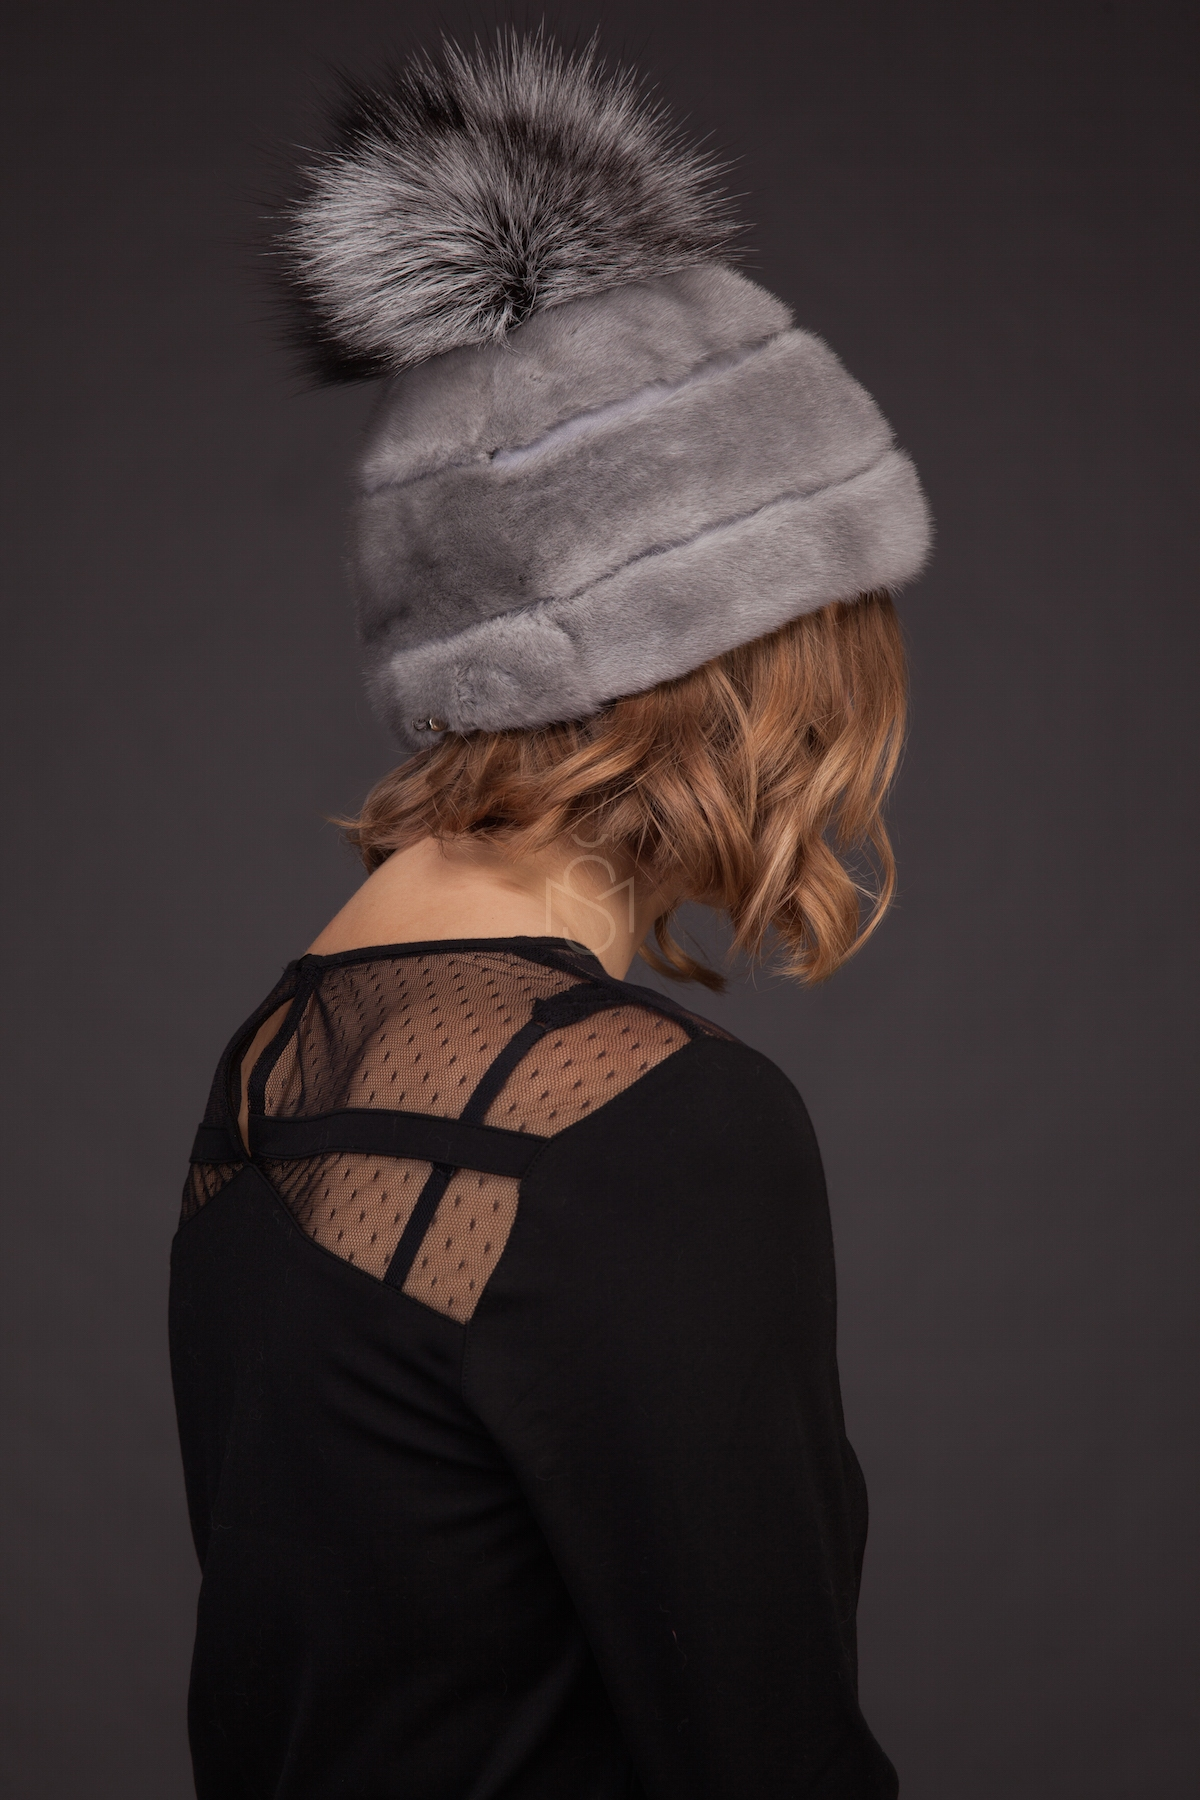 Sapphire_mink fur hat with pom-pom_made by SILTA MADA fur studio in Vilnius